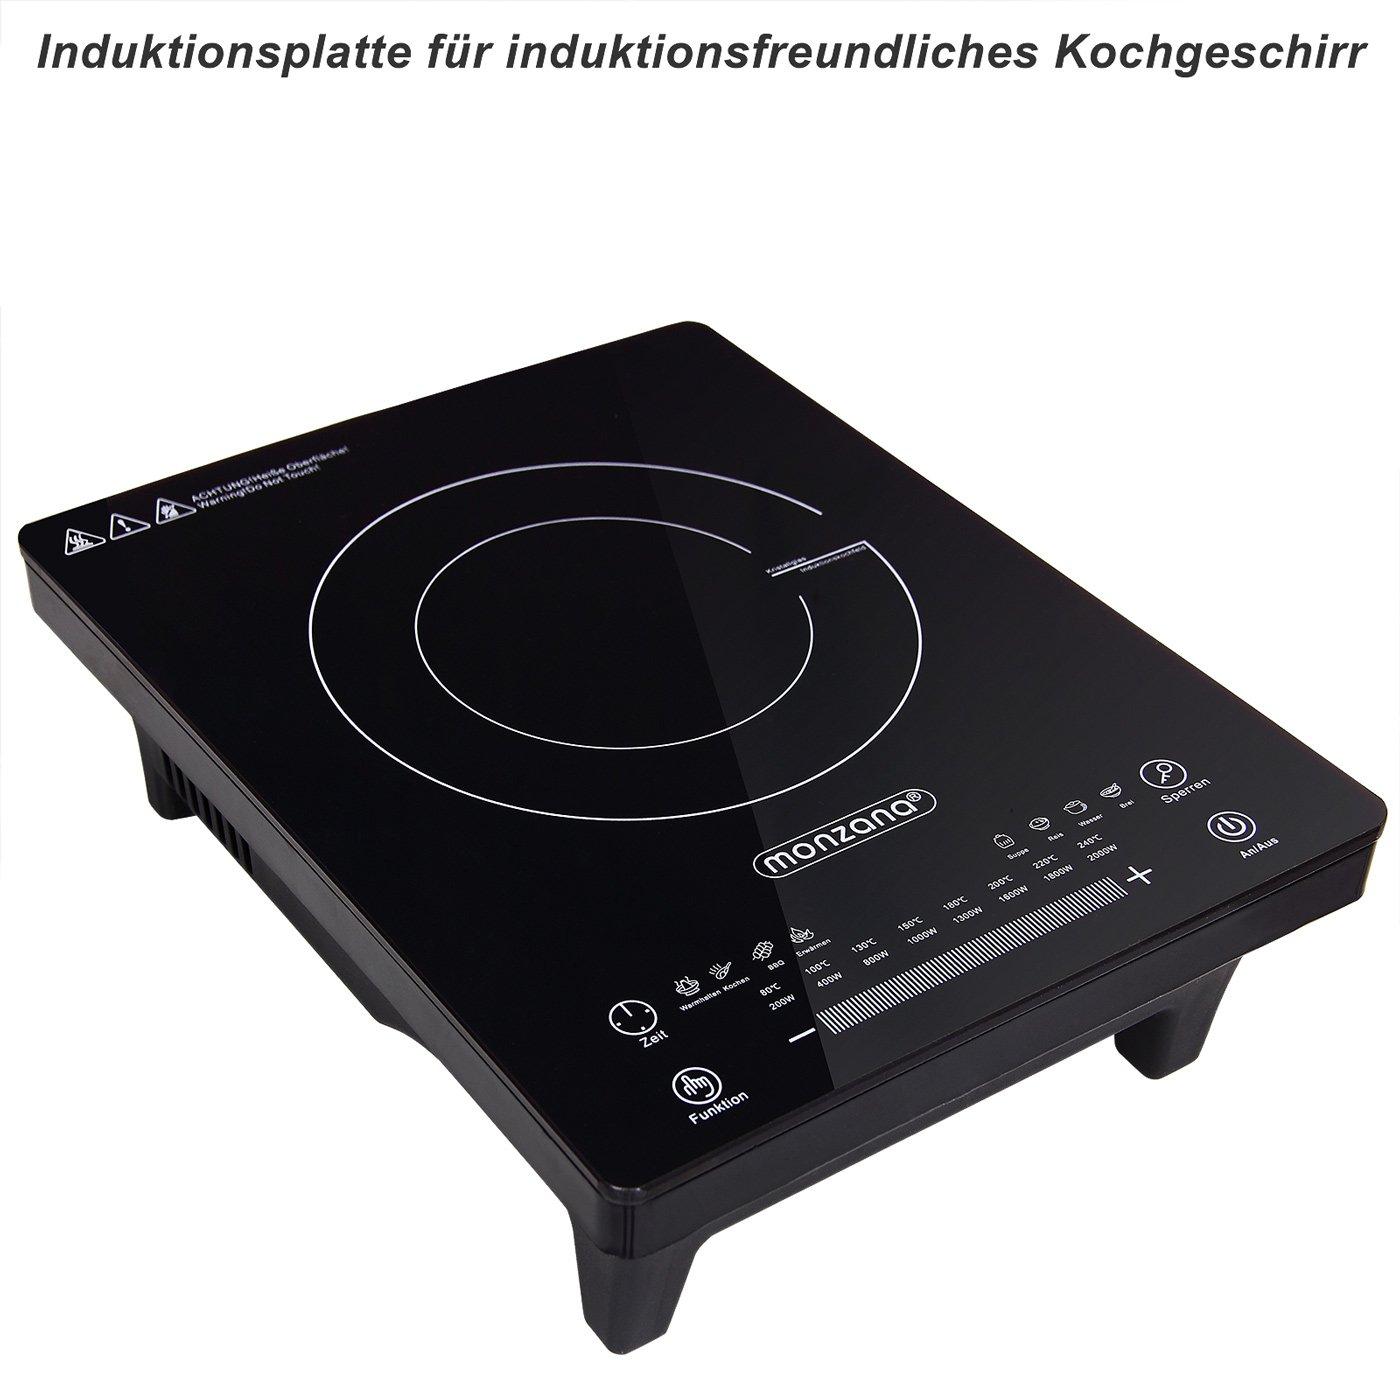 Monzana   Placa de inducción portátil   2000W   Temperatura ajustable de 80 ° C a 240 ° C   Función de temporizador   Pantalla LED   8 programas ...